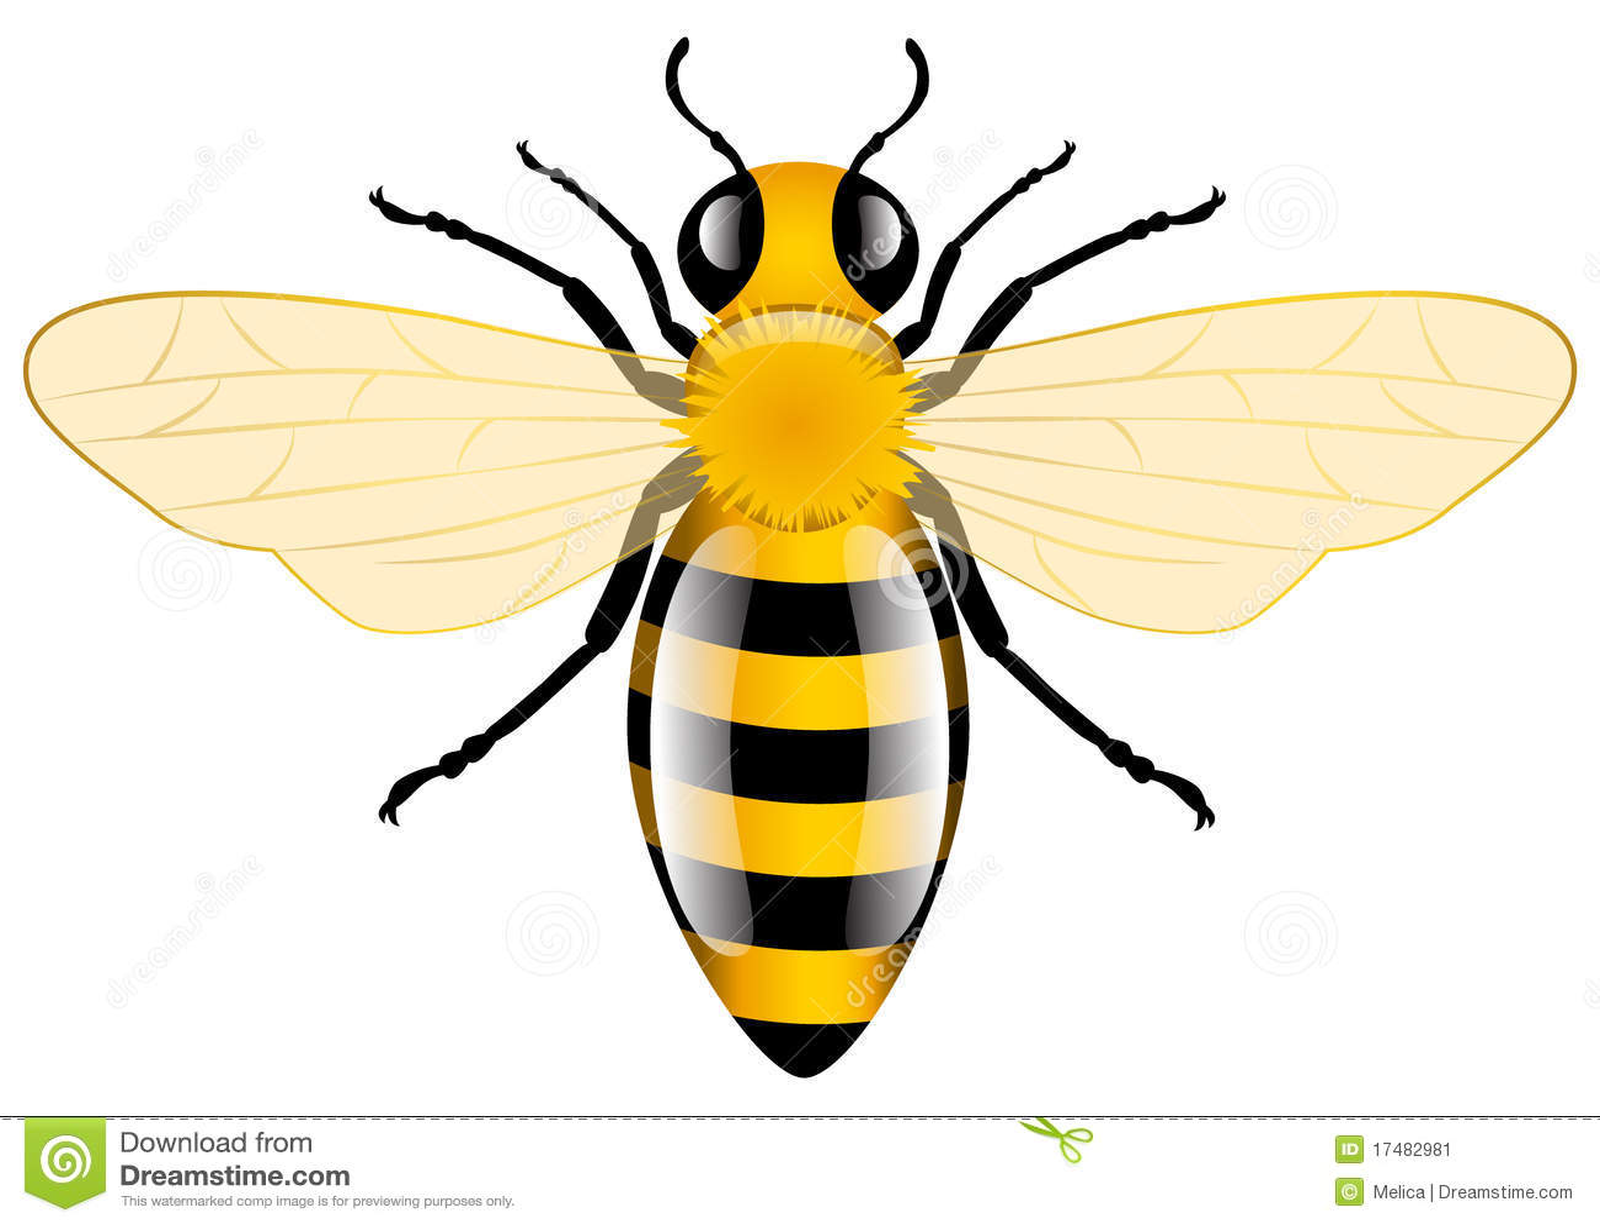 honey bee stock image image 17482981 honey bee clip art black and white honey bee clip art images free